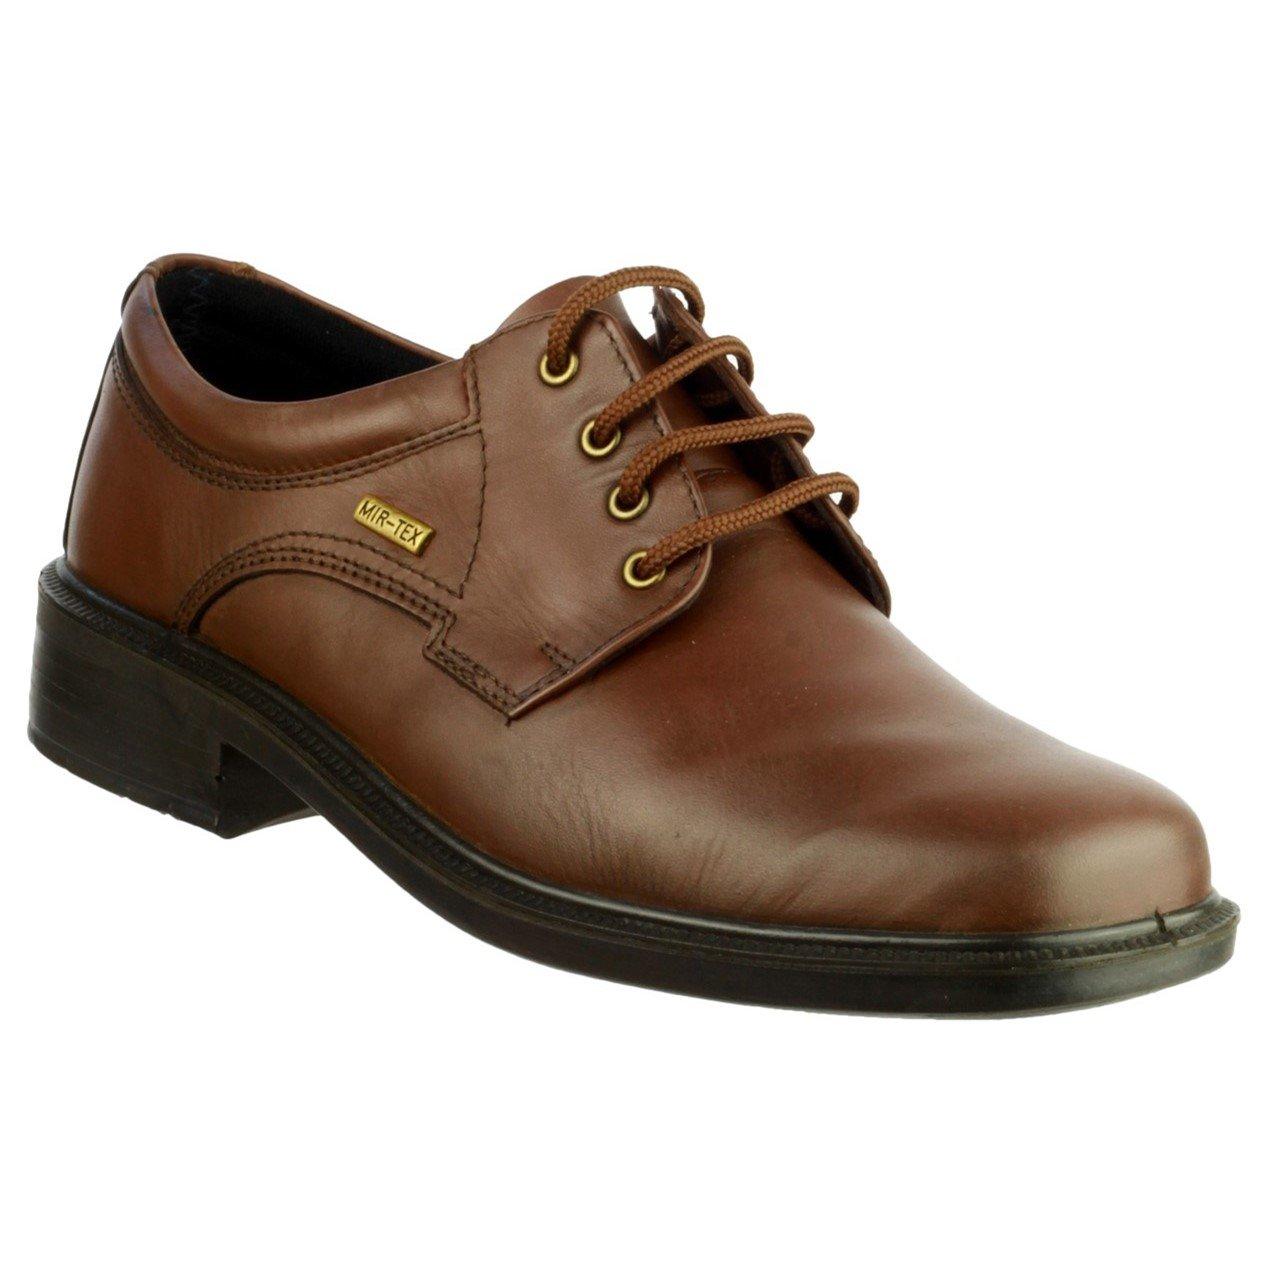 Cotswold Men's Sudeley Waterproof Shoe Various Colours 32970 - Brown 10